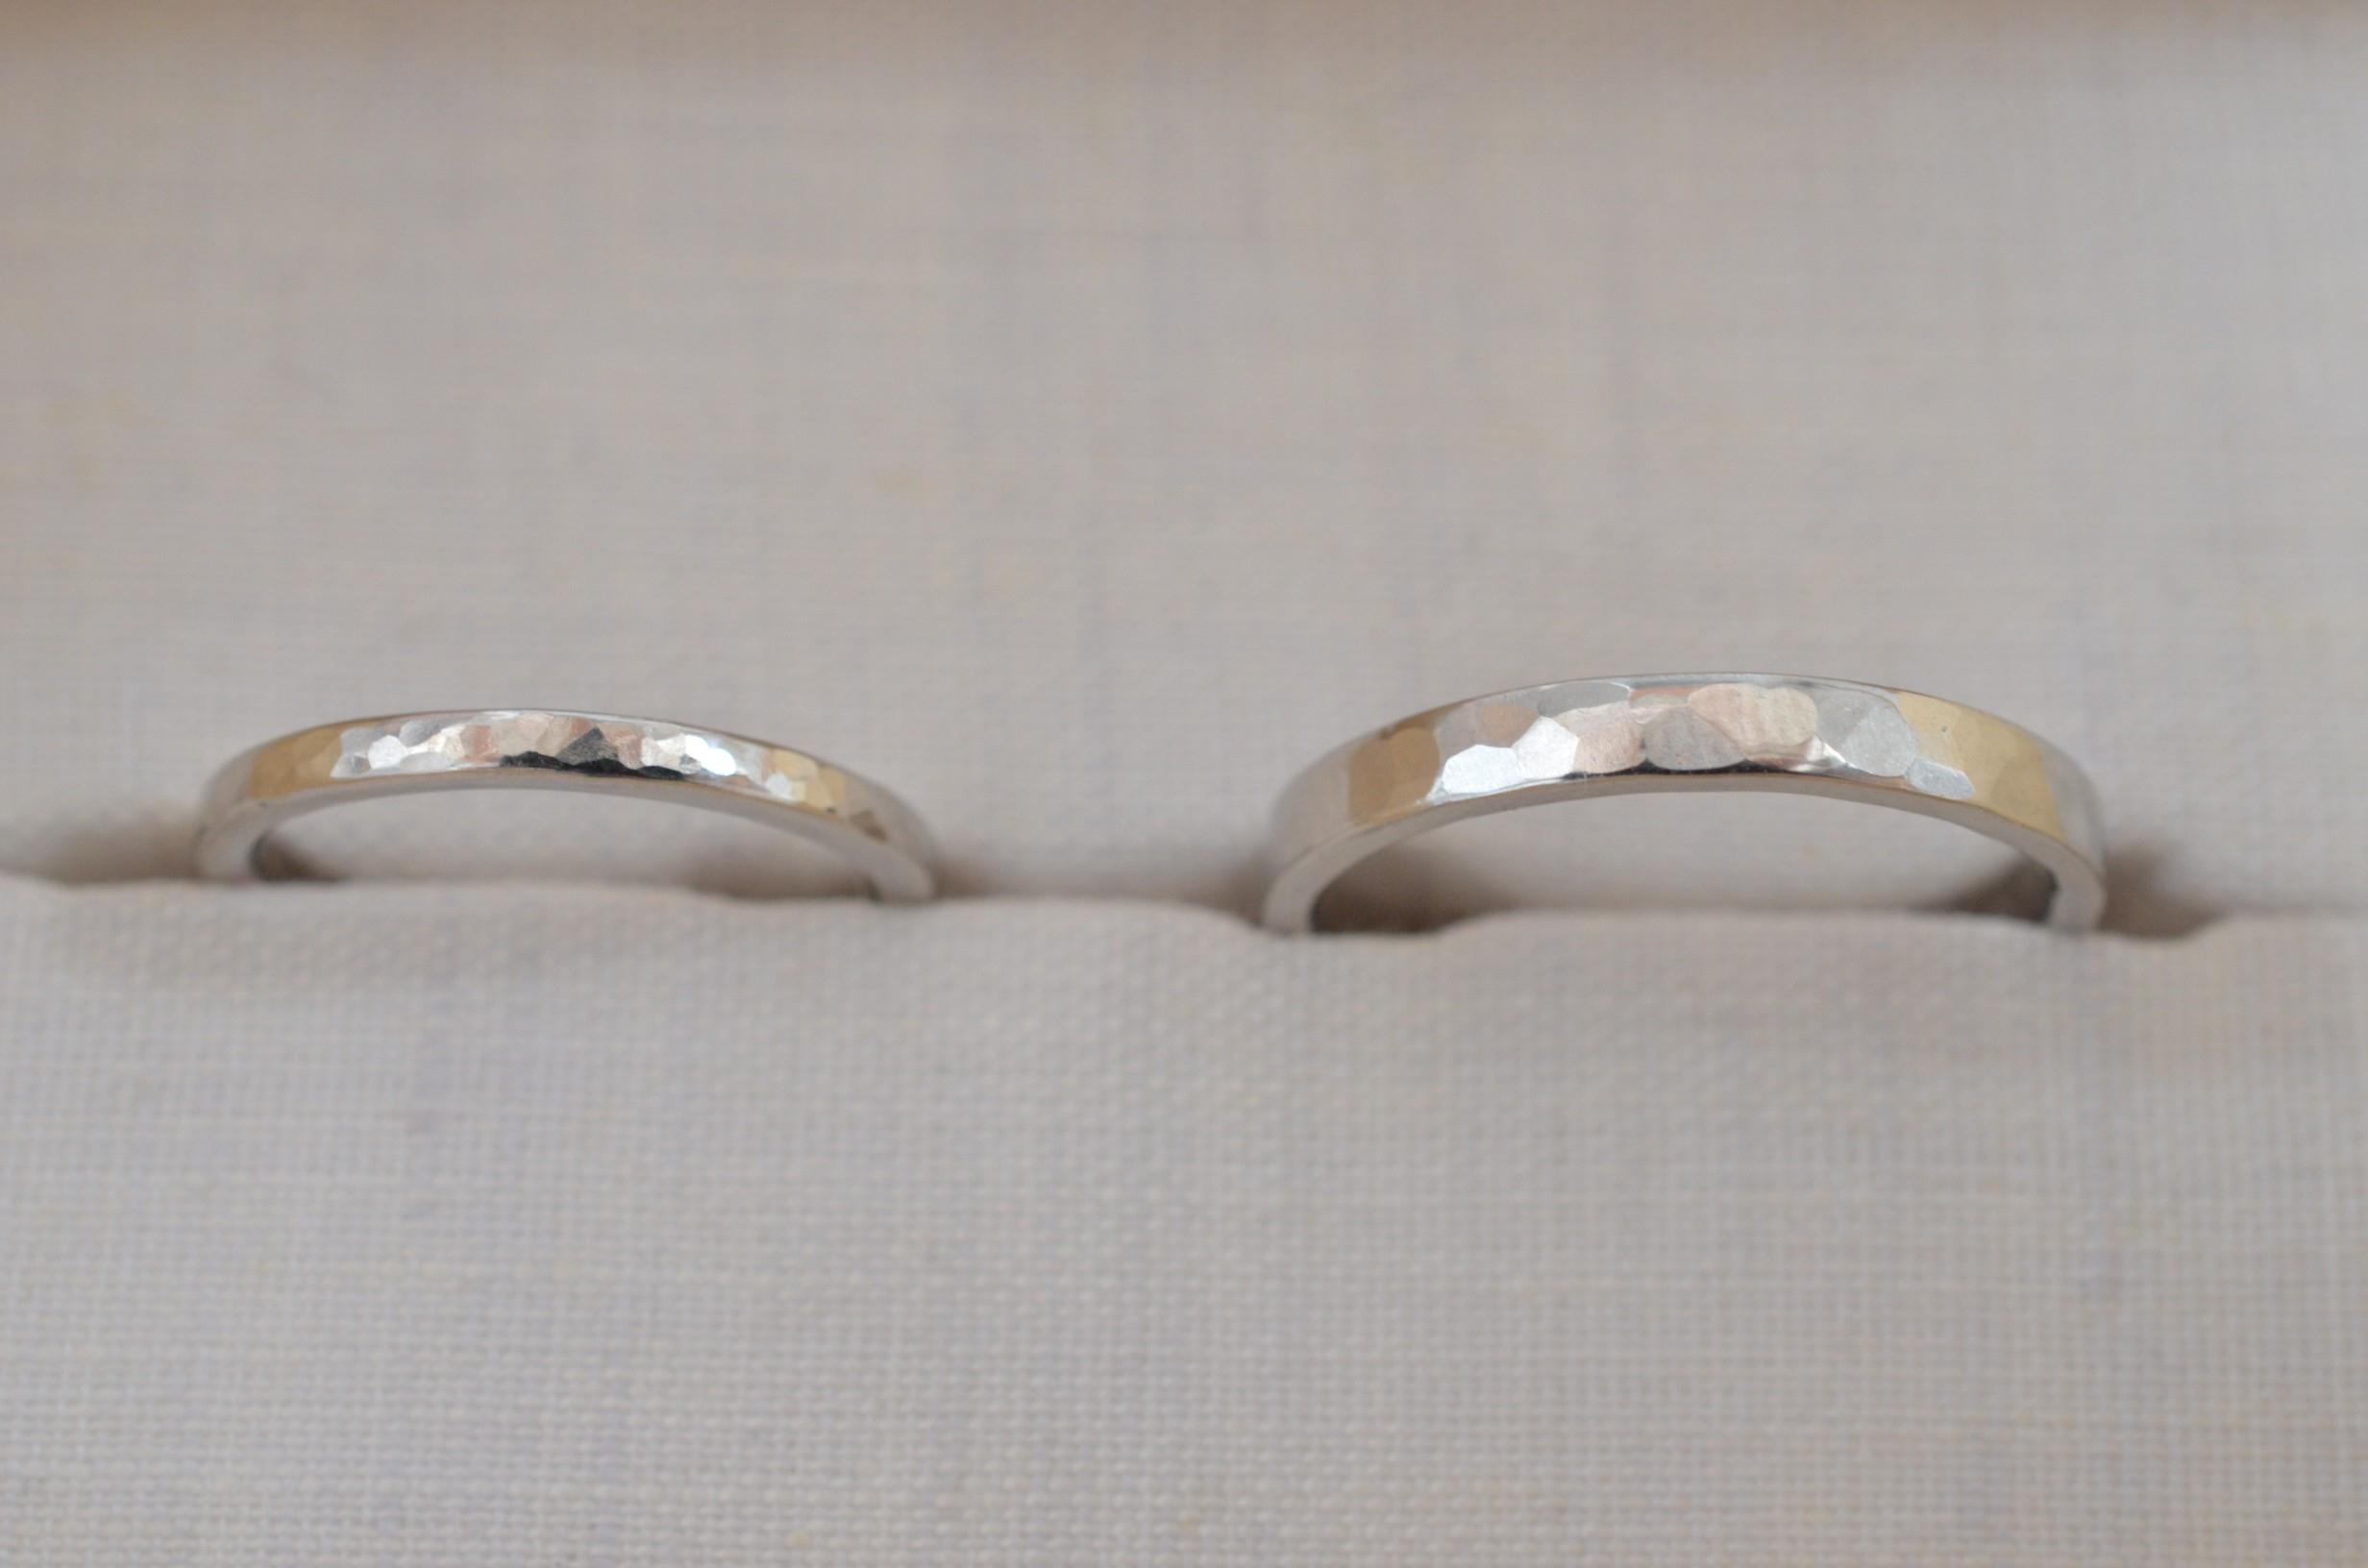 結婚指輪 Pt950 / 角 / 鎚目